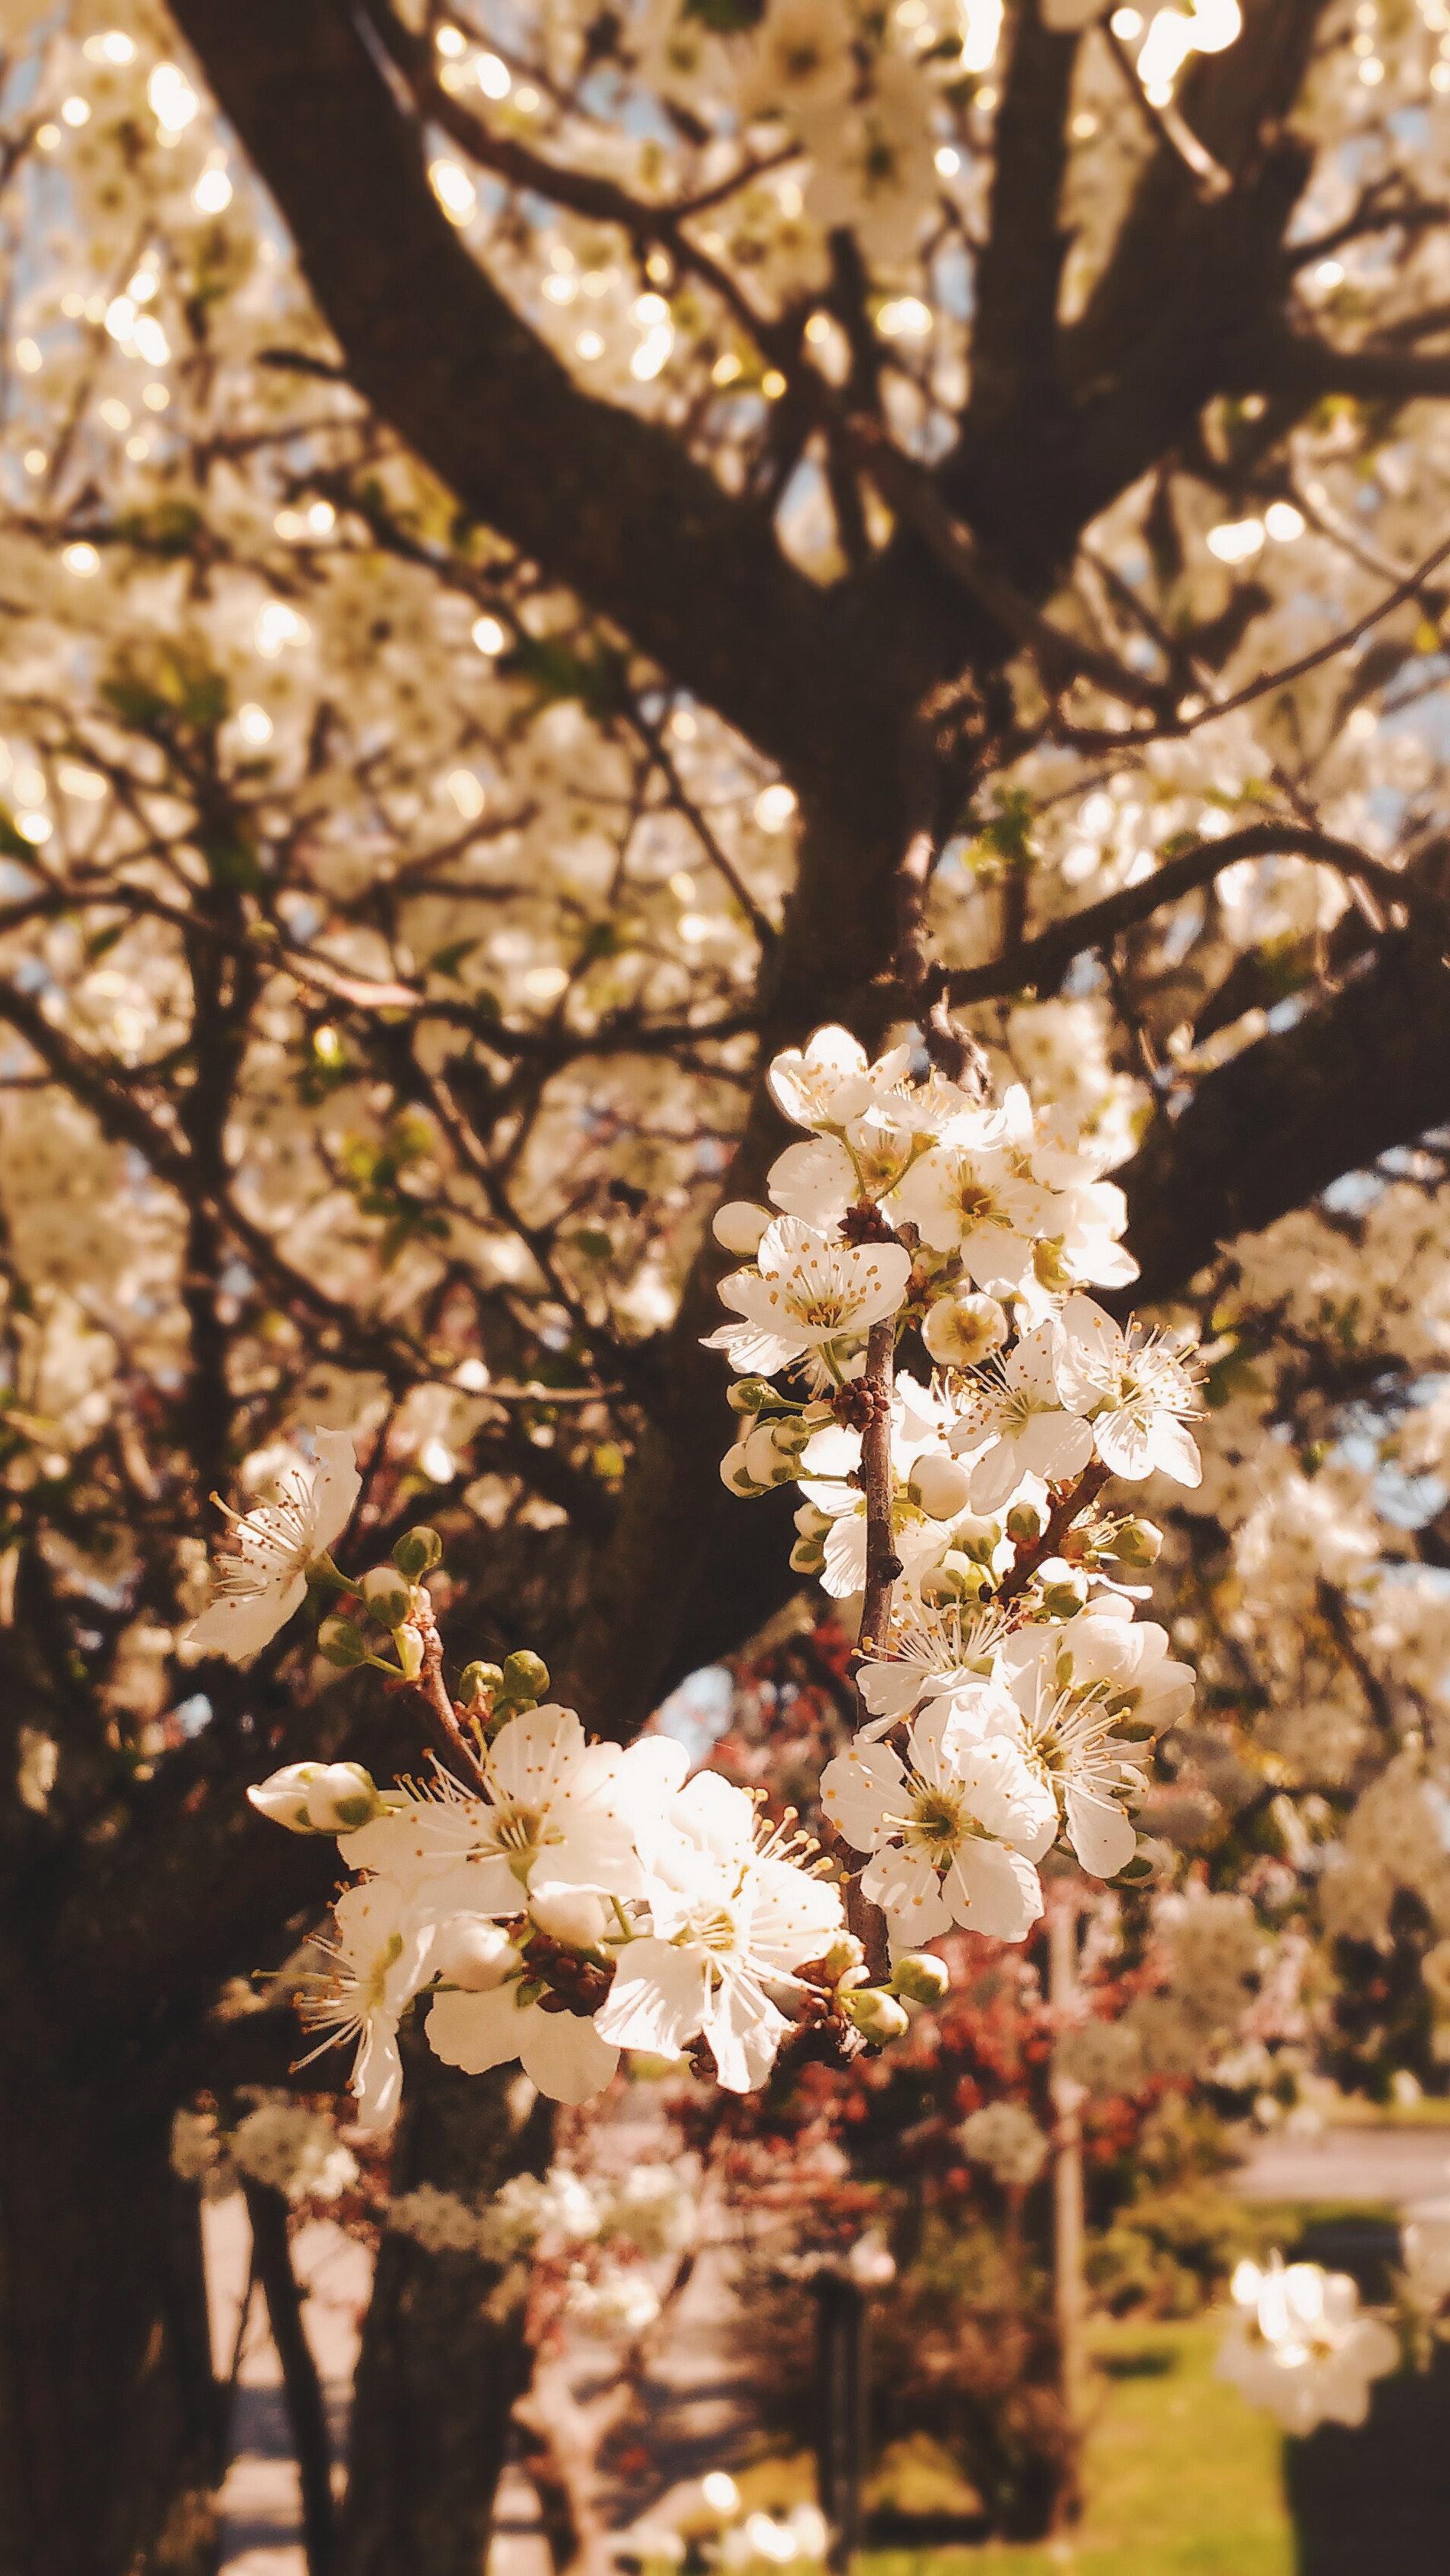 Unduh 980 Gambar Bunga Tumblr HD Gratid